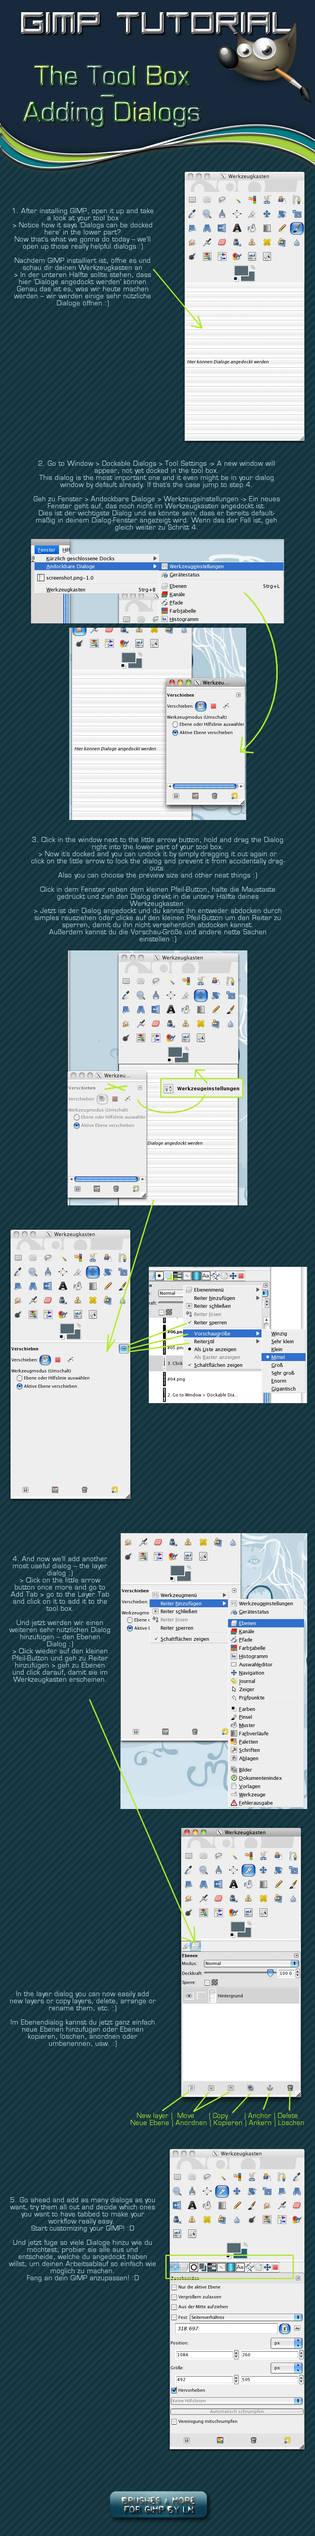 GIMP The Tool Box-Add Dialogs